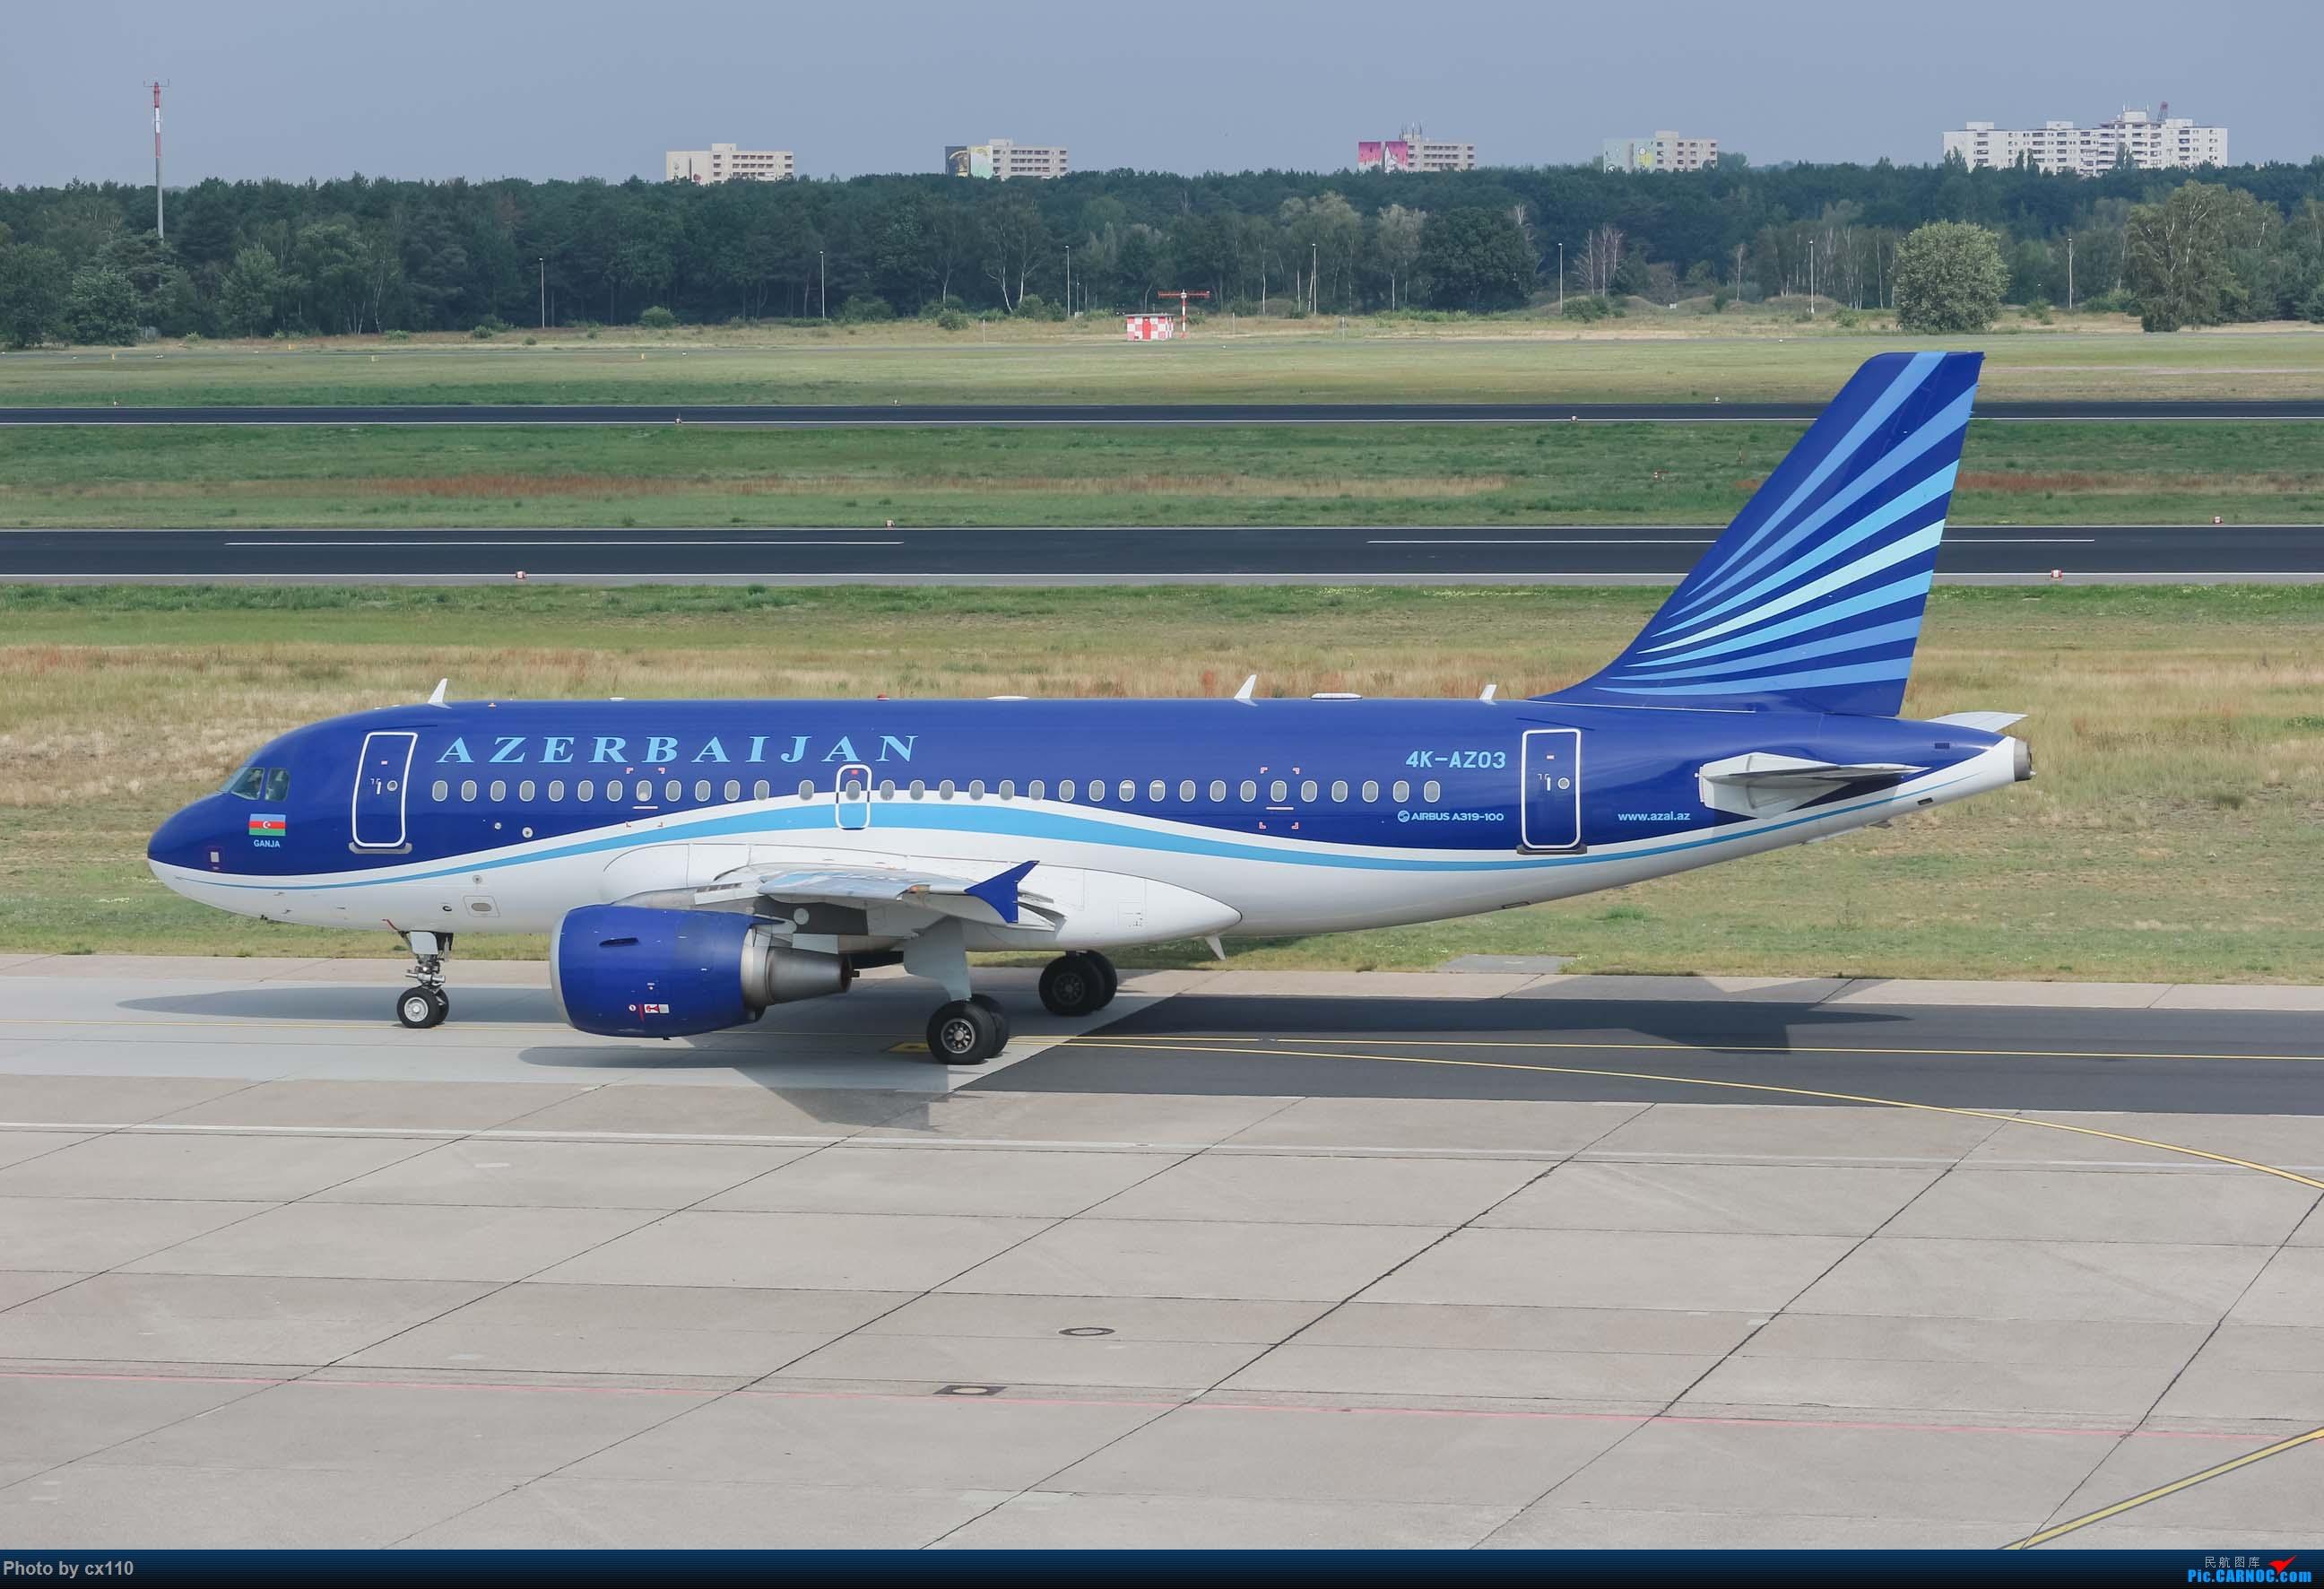 Re:[原创]欧洲机场拍机记-柏林/赫尔辛基/布拉格 AIRBUS A319-100 4K-AZ03